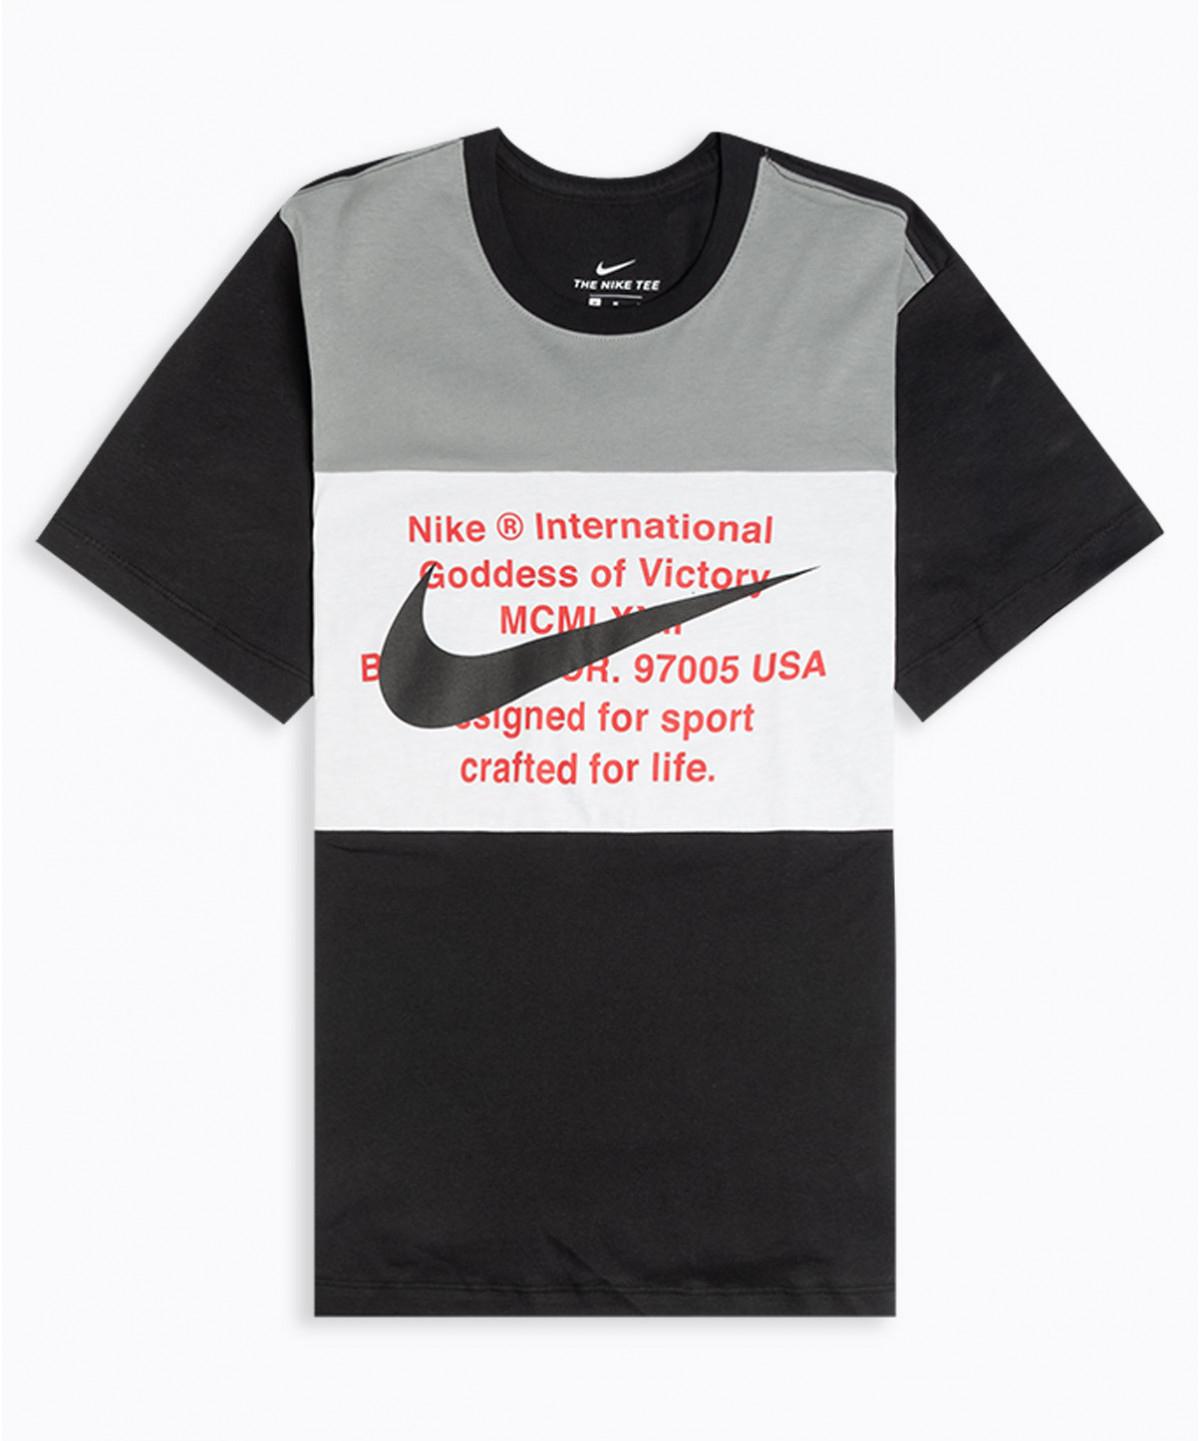 Mini recopilación camisetas Nike por 10€ o menos [Pocas tallas]